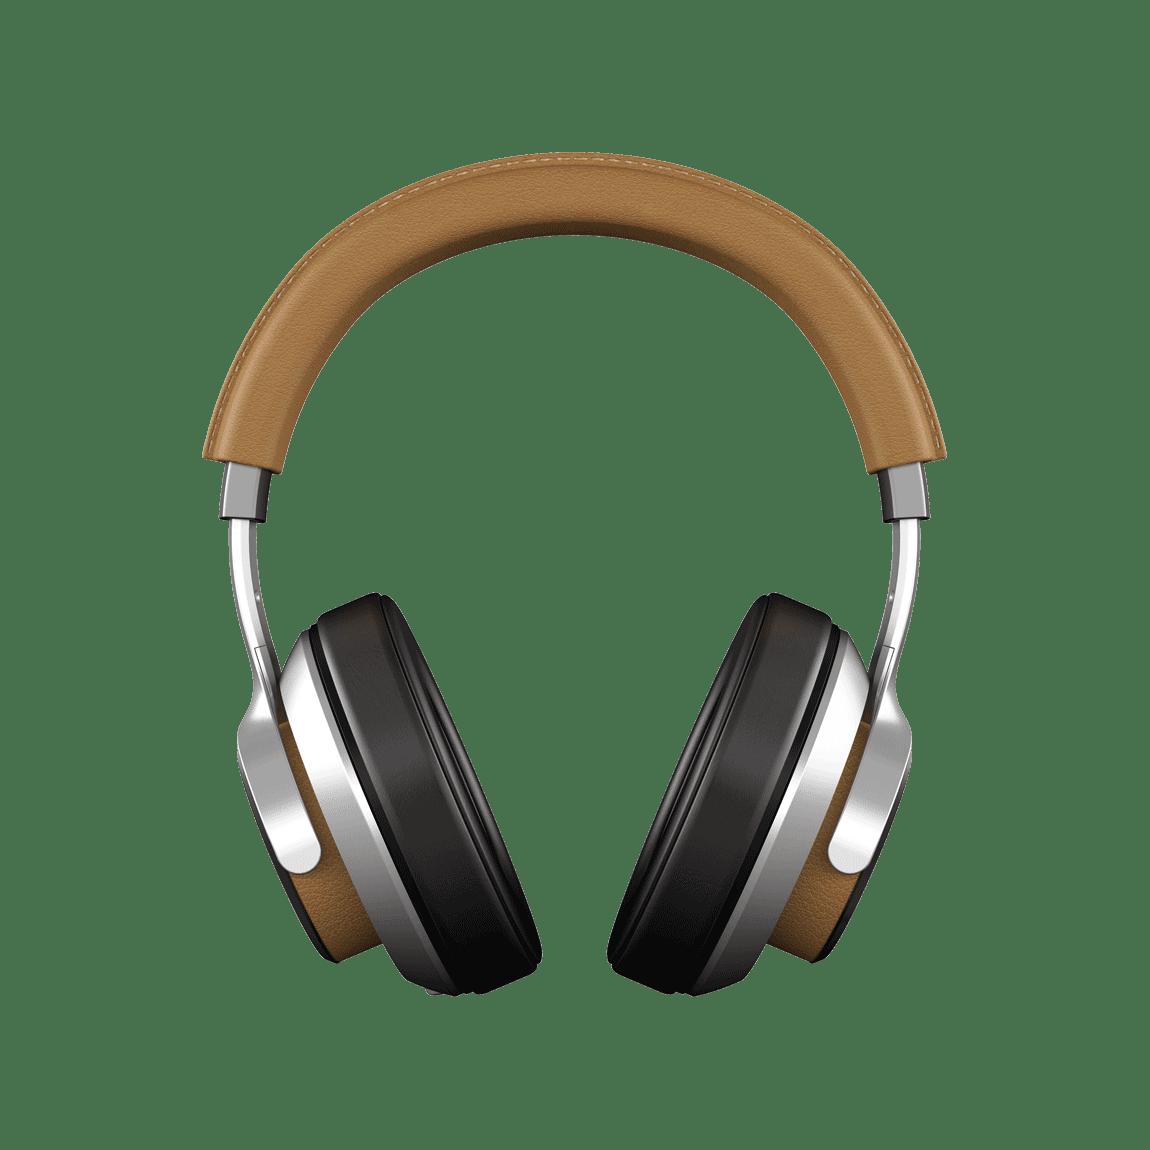 Sennheiser Headphone Transparent Clipart